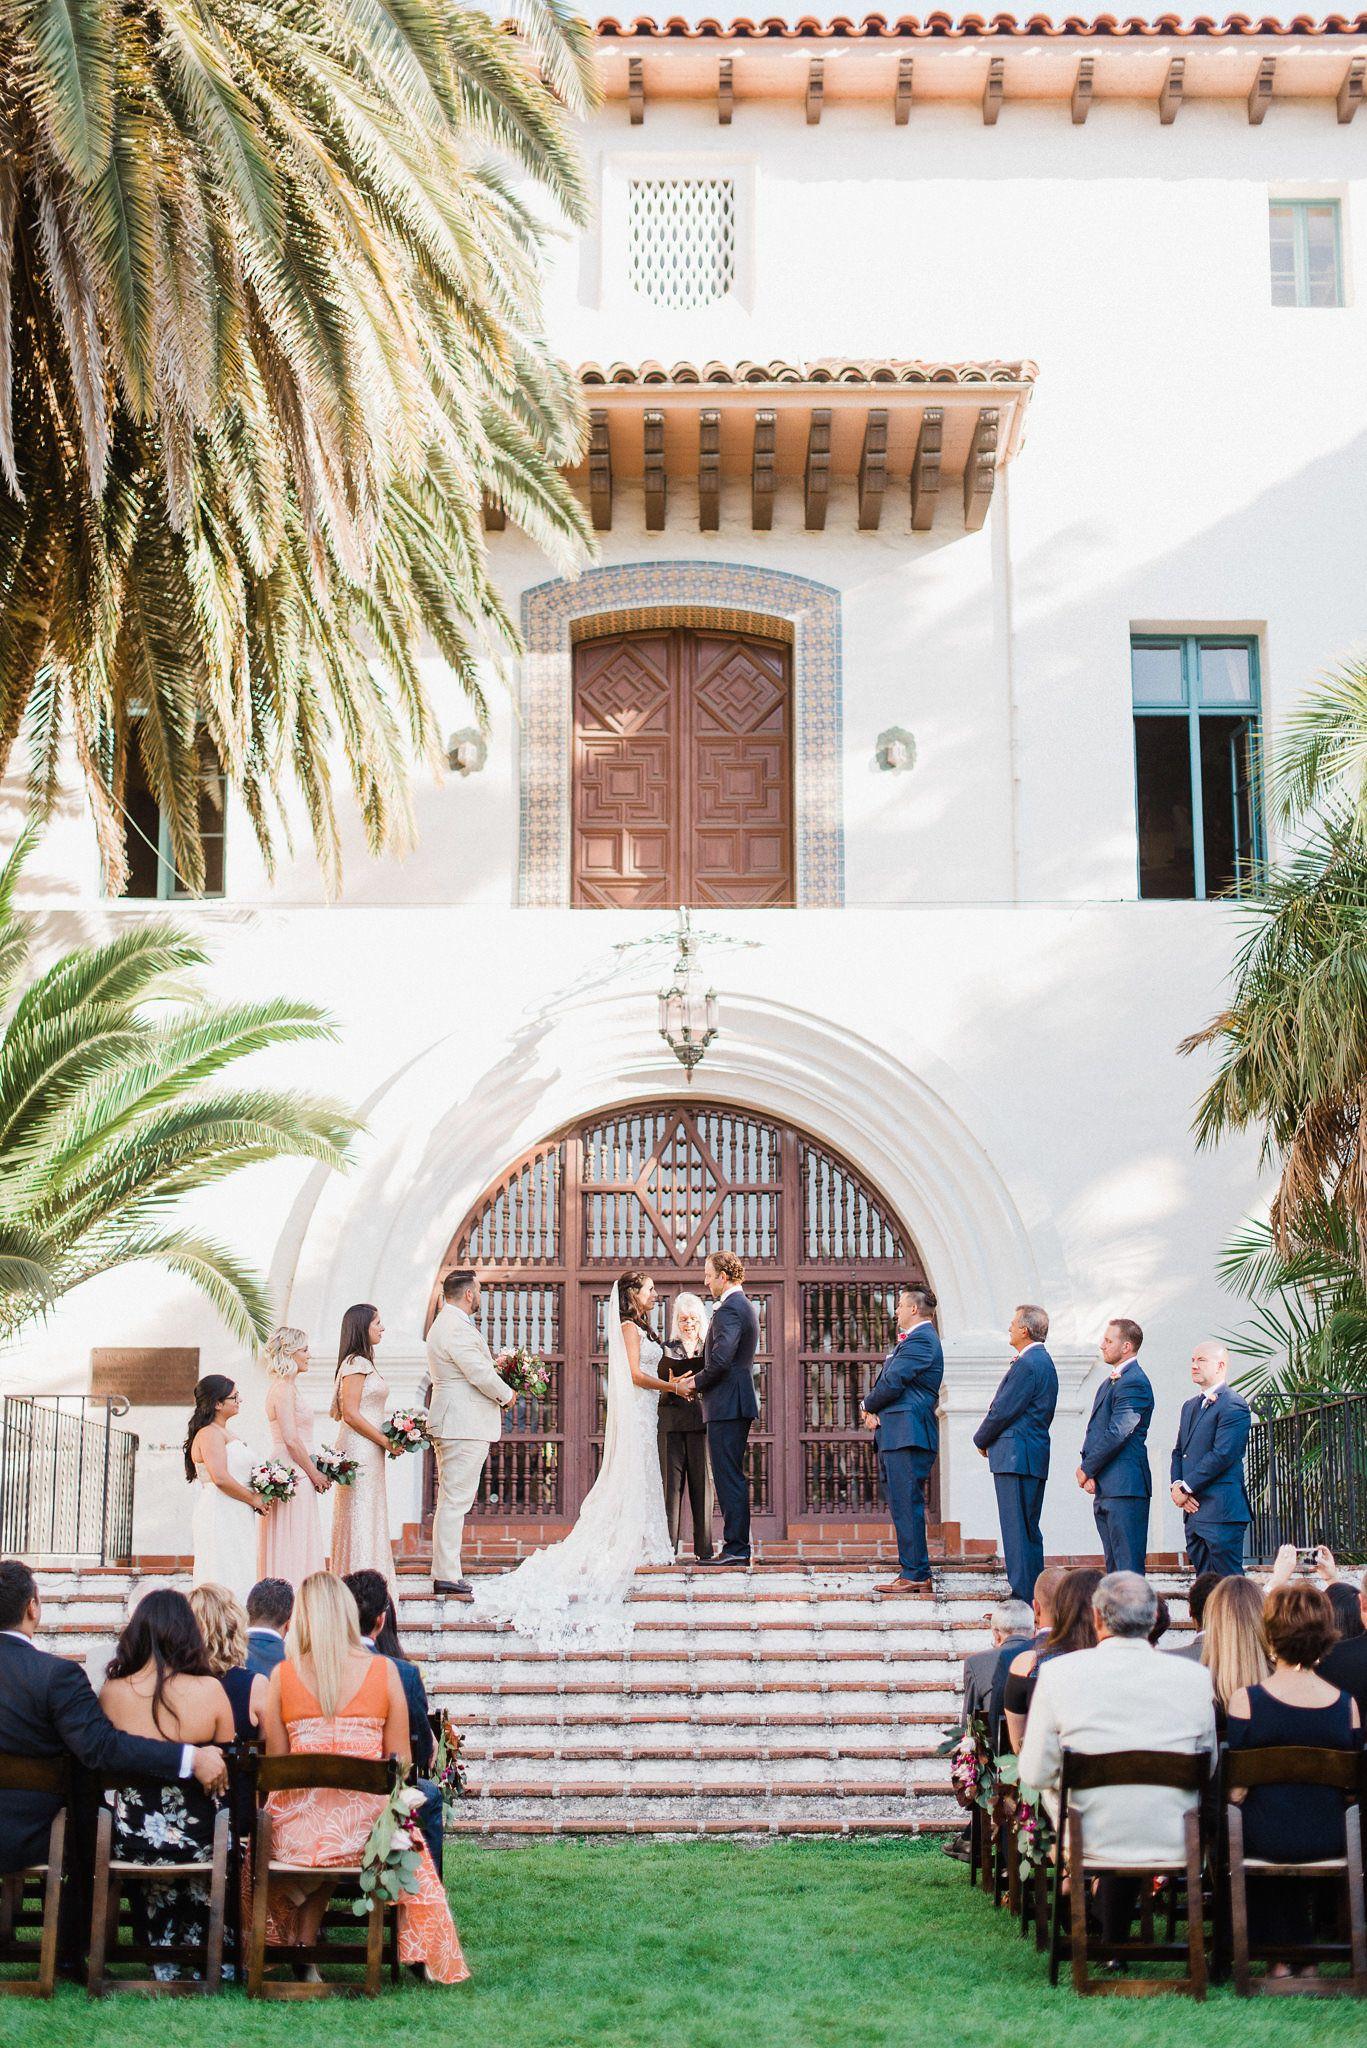 Www Santabarbarawedding Com Grace Kathryn Photography Santa Barbara C Santa Barbara Courthouse Wedding Santa Barbara Courthouse Santa Barbara Wedding Venue